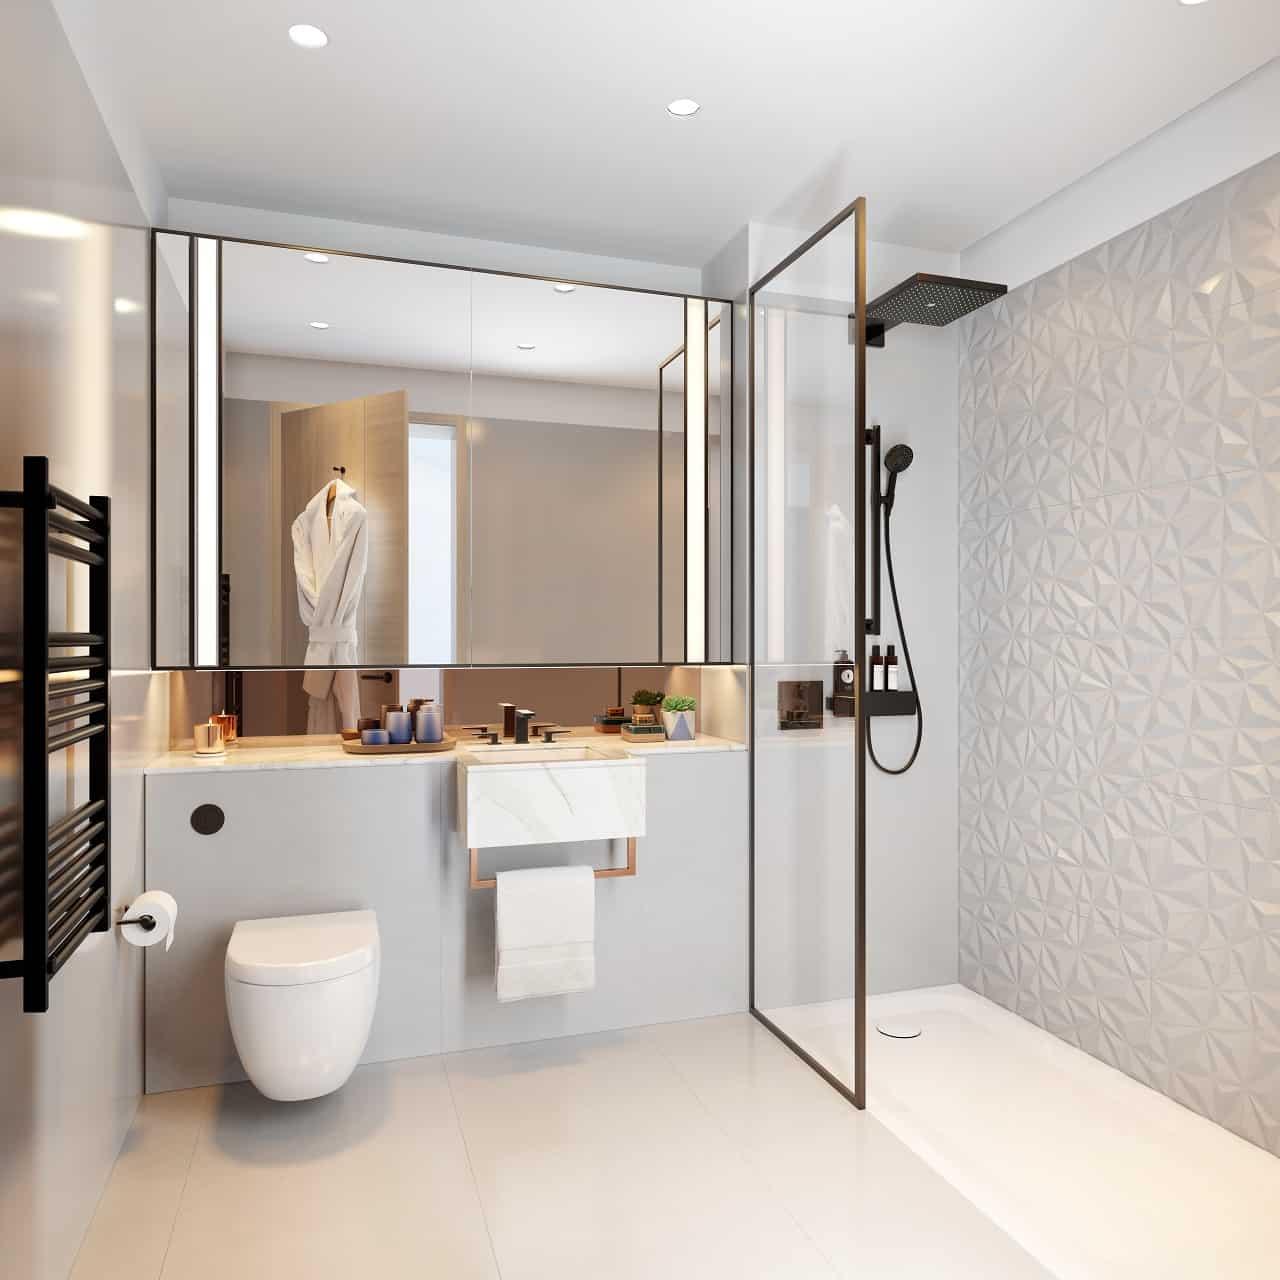 Raeon-Aspen-Level-56-Type-3A1u-Bathroom